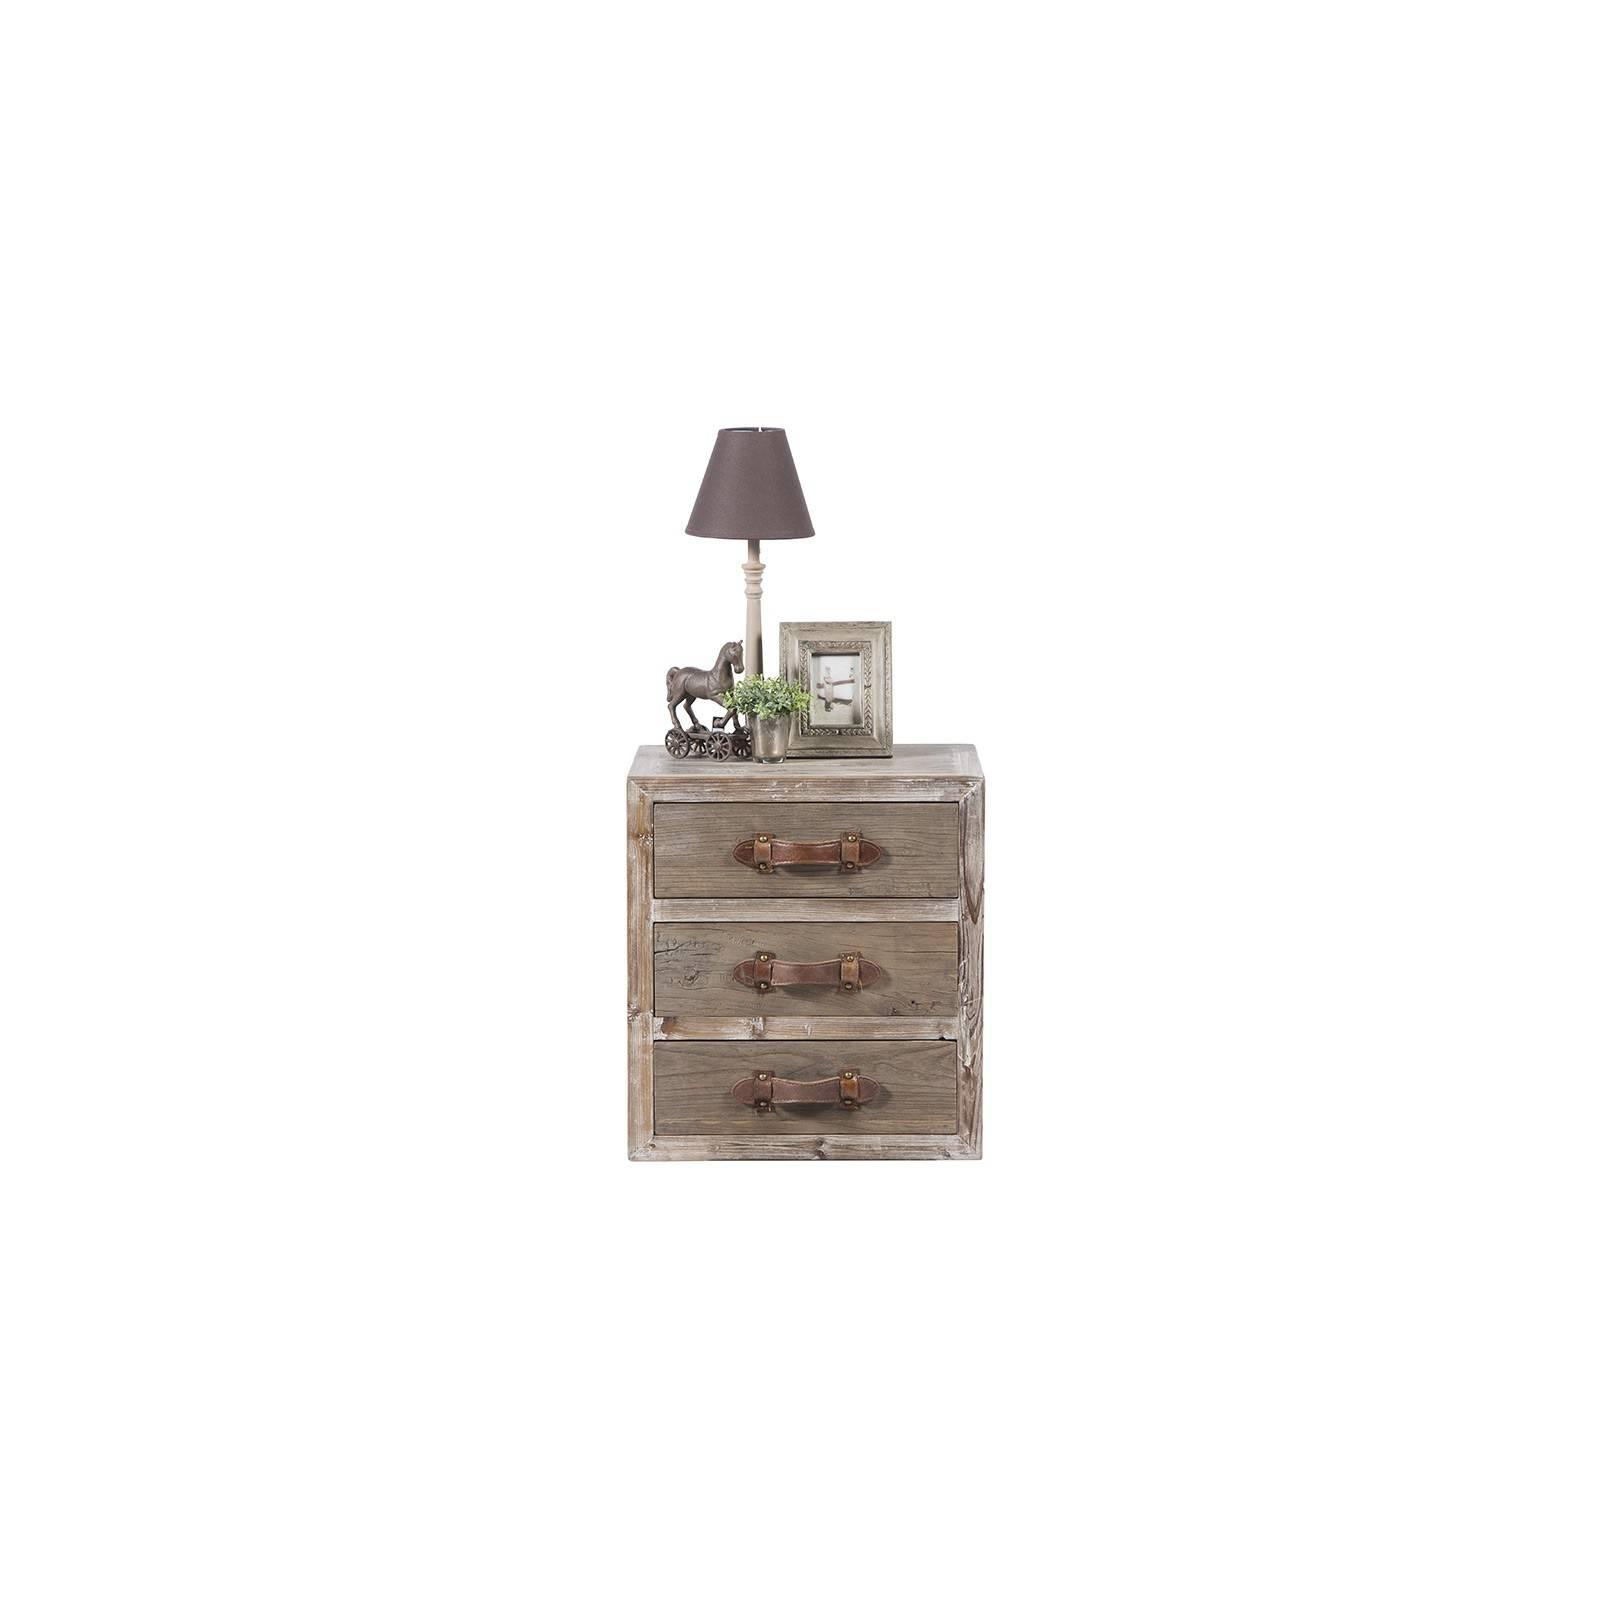 chevet collection flamand orme massif style campagne et industriel. Black Bedroom Furniture Sets. Home Design Ideas